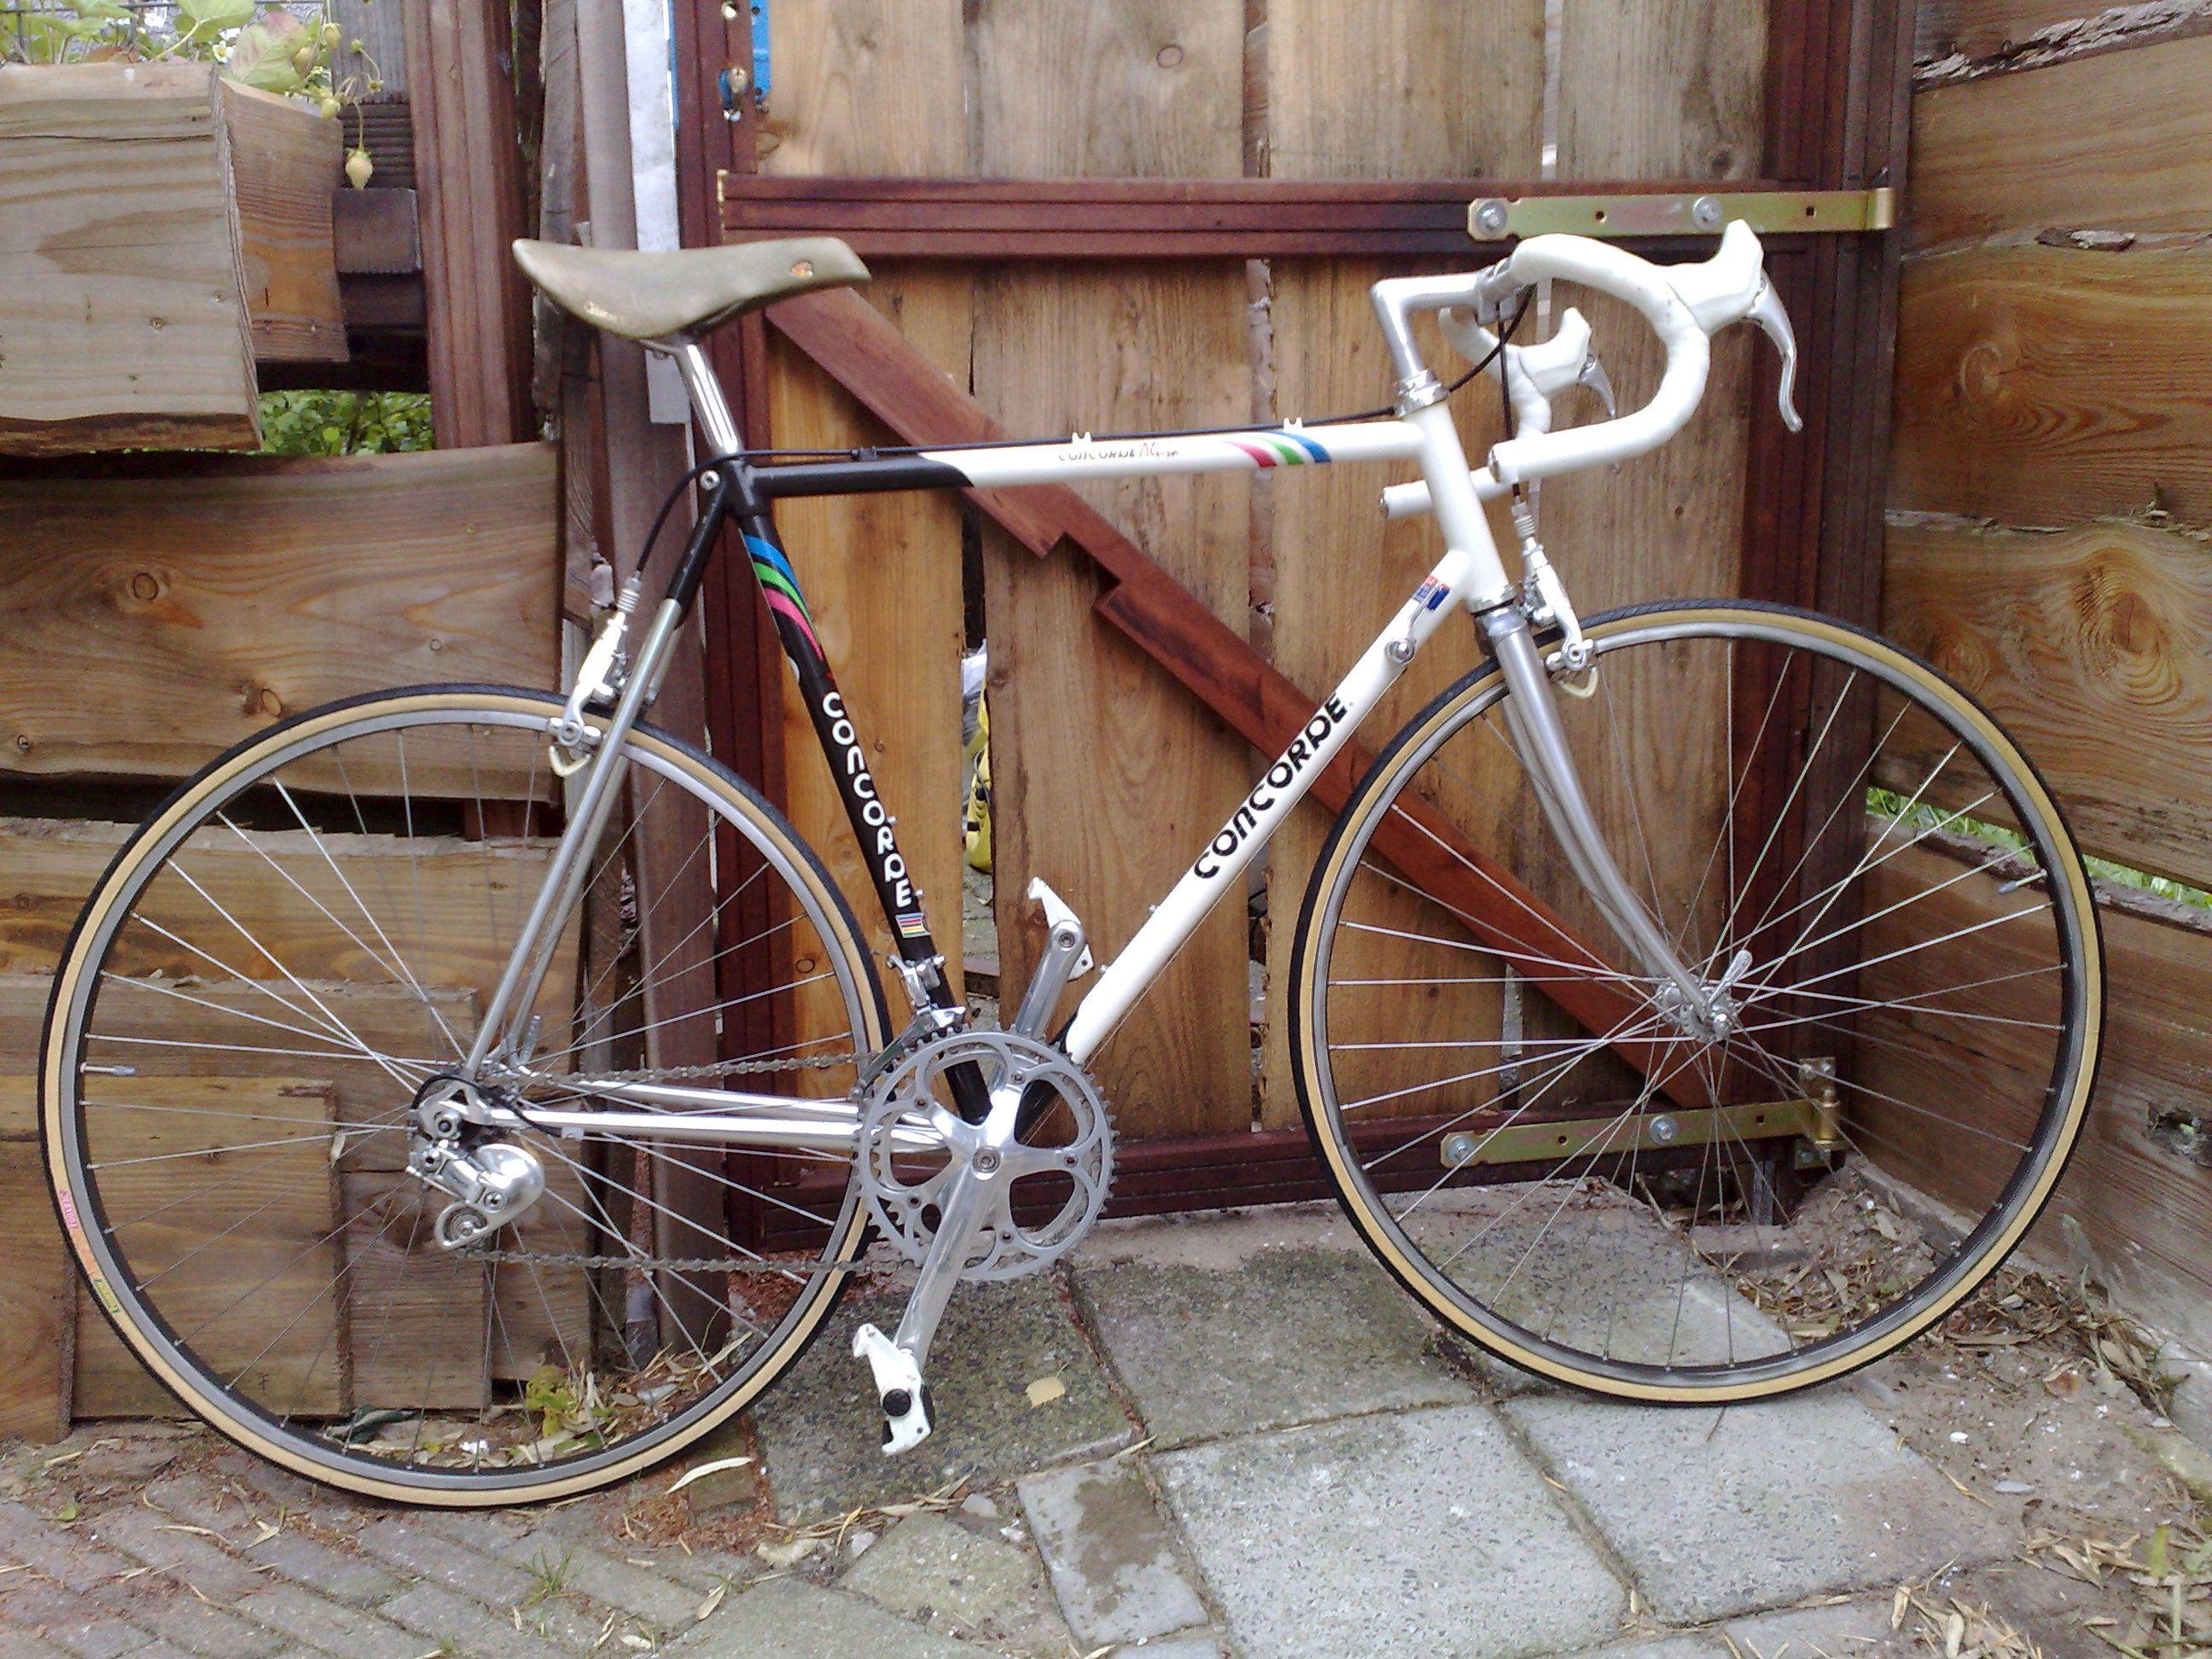 Te Koop Concorde Alura Maat 58 Italiaanse Racefietsen Concorde Bikes For Sale Vintage Bicycles